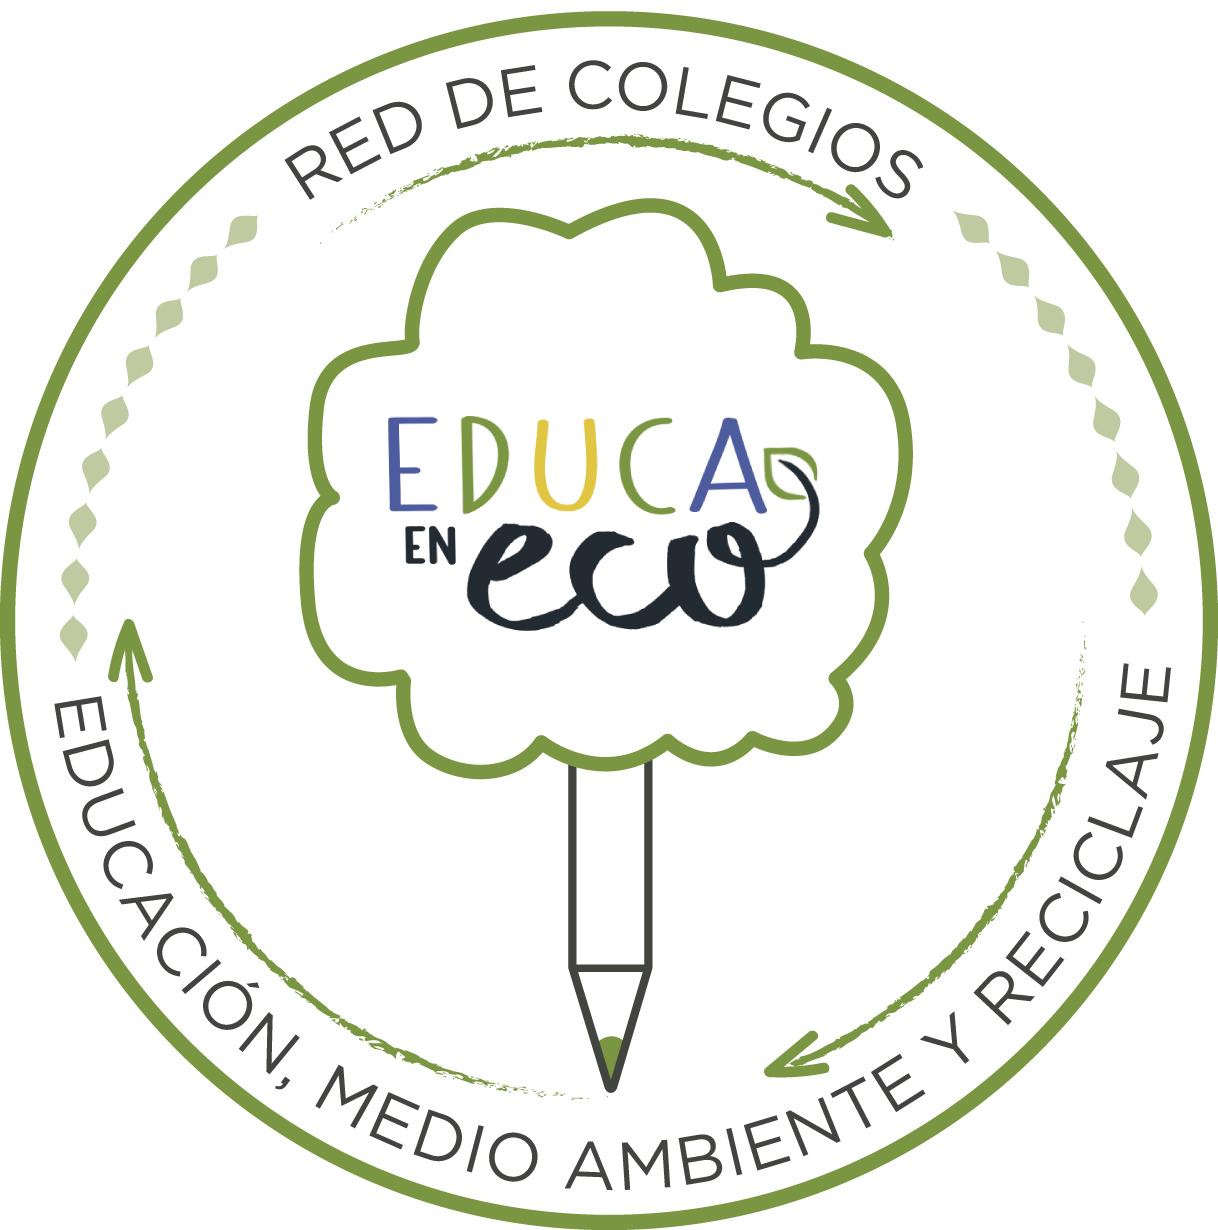 REDE COLEGIOS EDUCA EN ECO